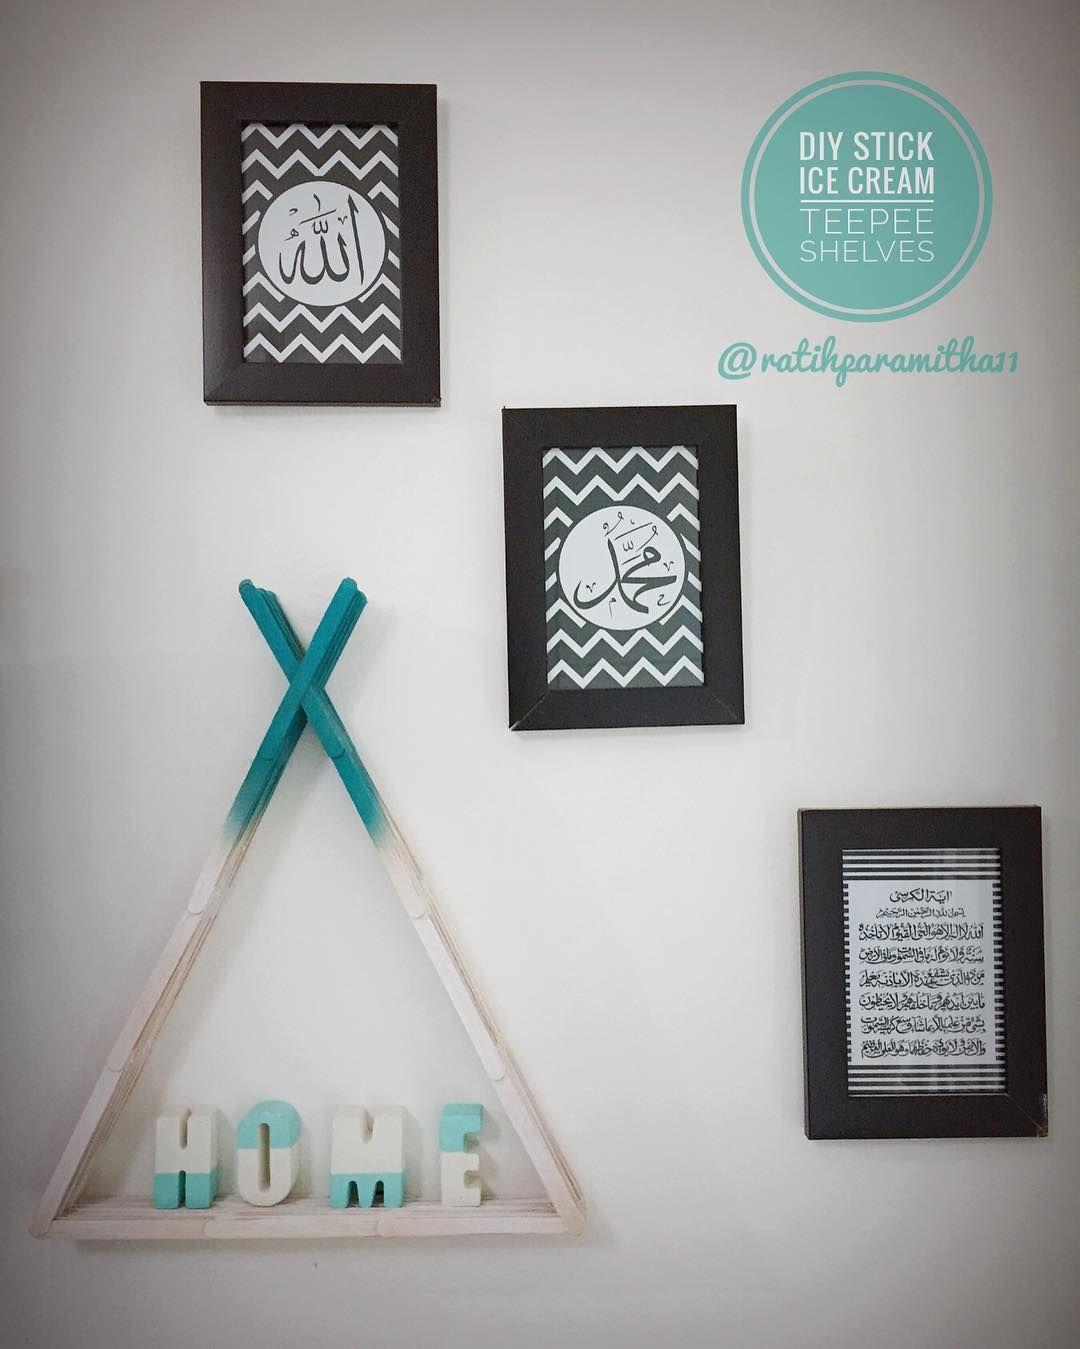 Hiasan Dinding Buatan Sendiri Bermotif Islami Ide Hiasan Dinding